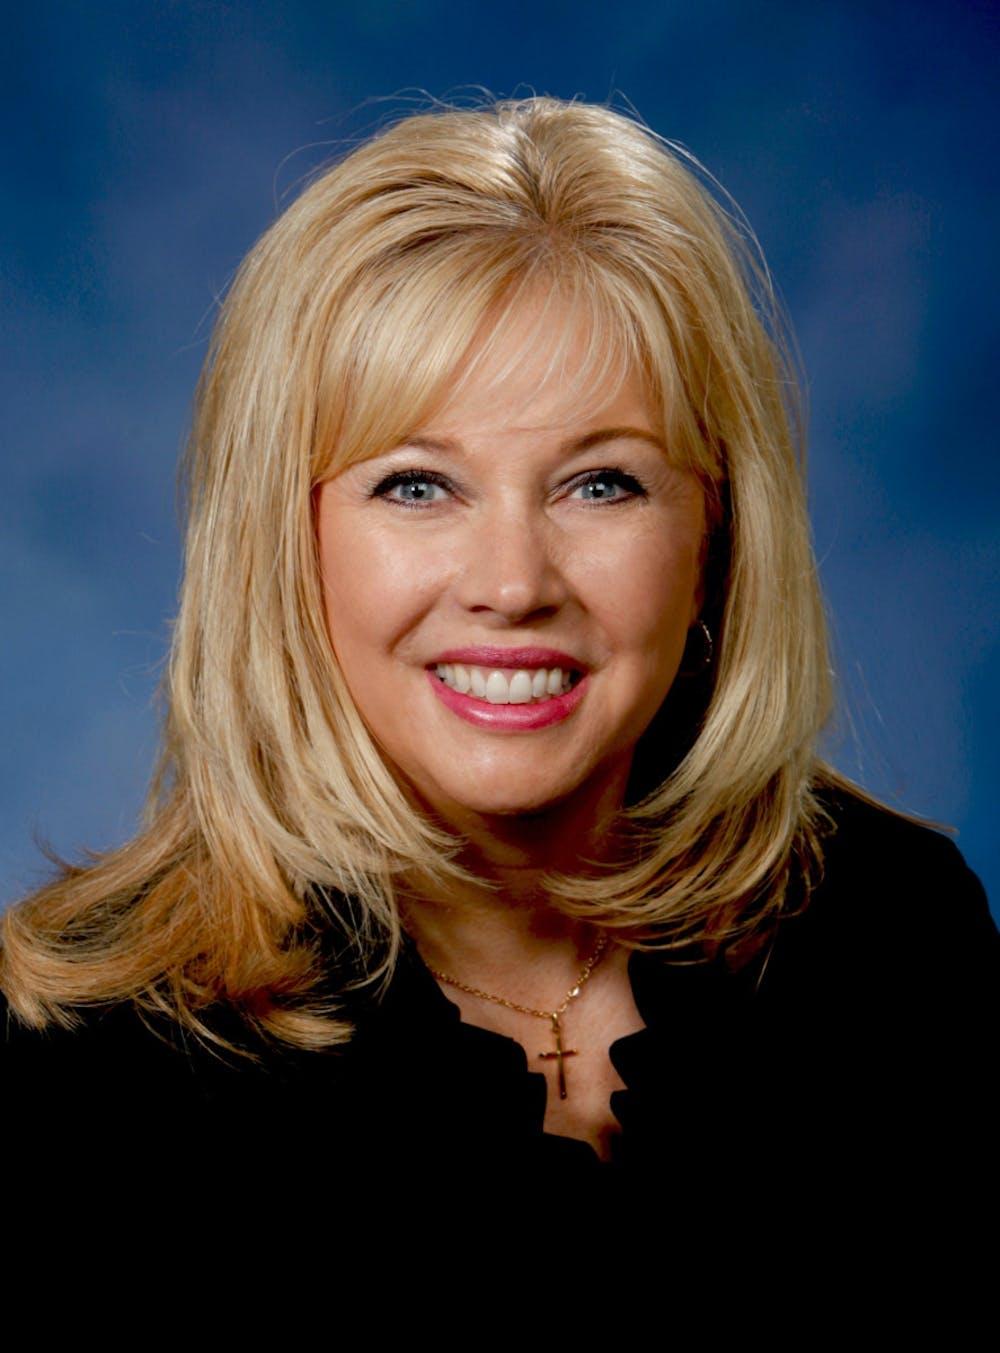 <p>Former MSU Board of Trustee nominee and co-director of Michigan Political Leadership Program Tonya Schuitmaker is pictured. Photo courtesy of Tonya Schuitmaker.</p>